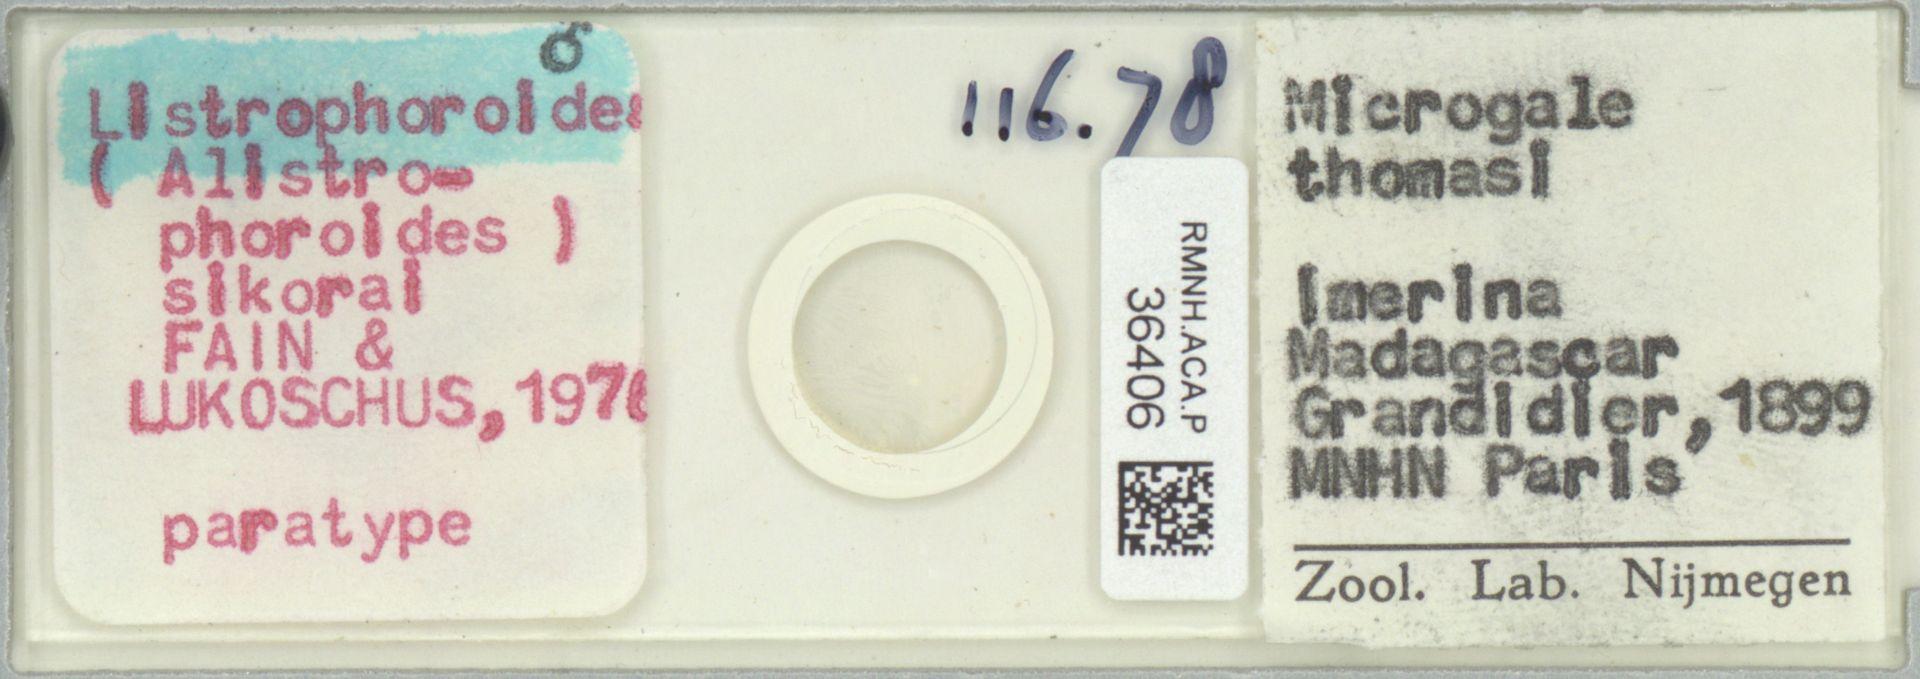 RMNH.ACA.P.36406   Listrophoroides (Alistrophoroides) sikorai Fain & Lukoschus 197@